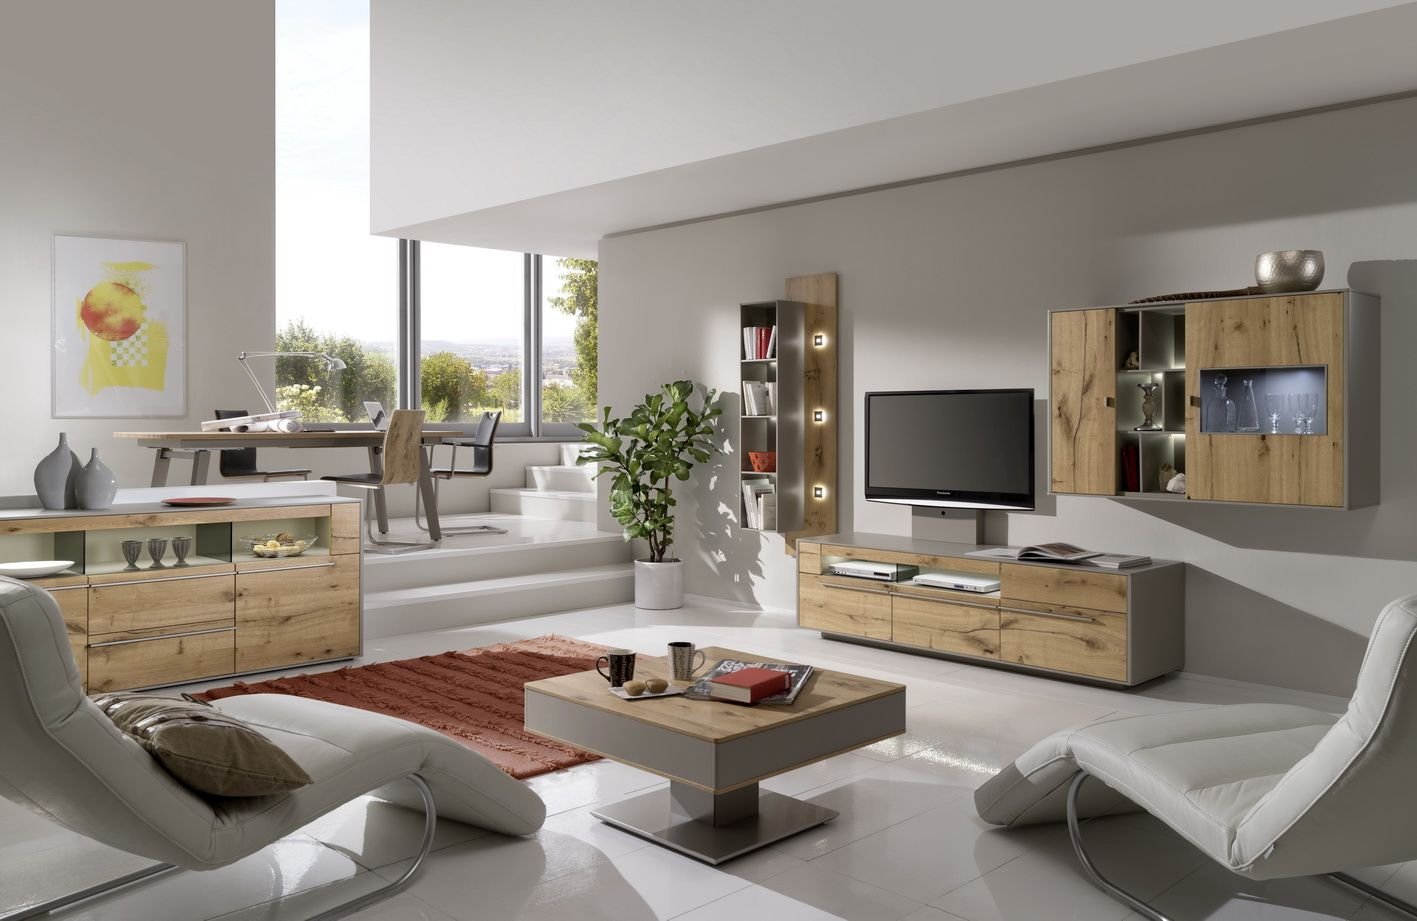 Beautiful #möbel #madeingermany #furniture #gwinner #wohndesign #design #wohnzimmer  #livingroom Nice Design